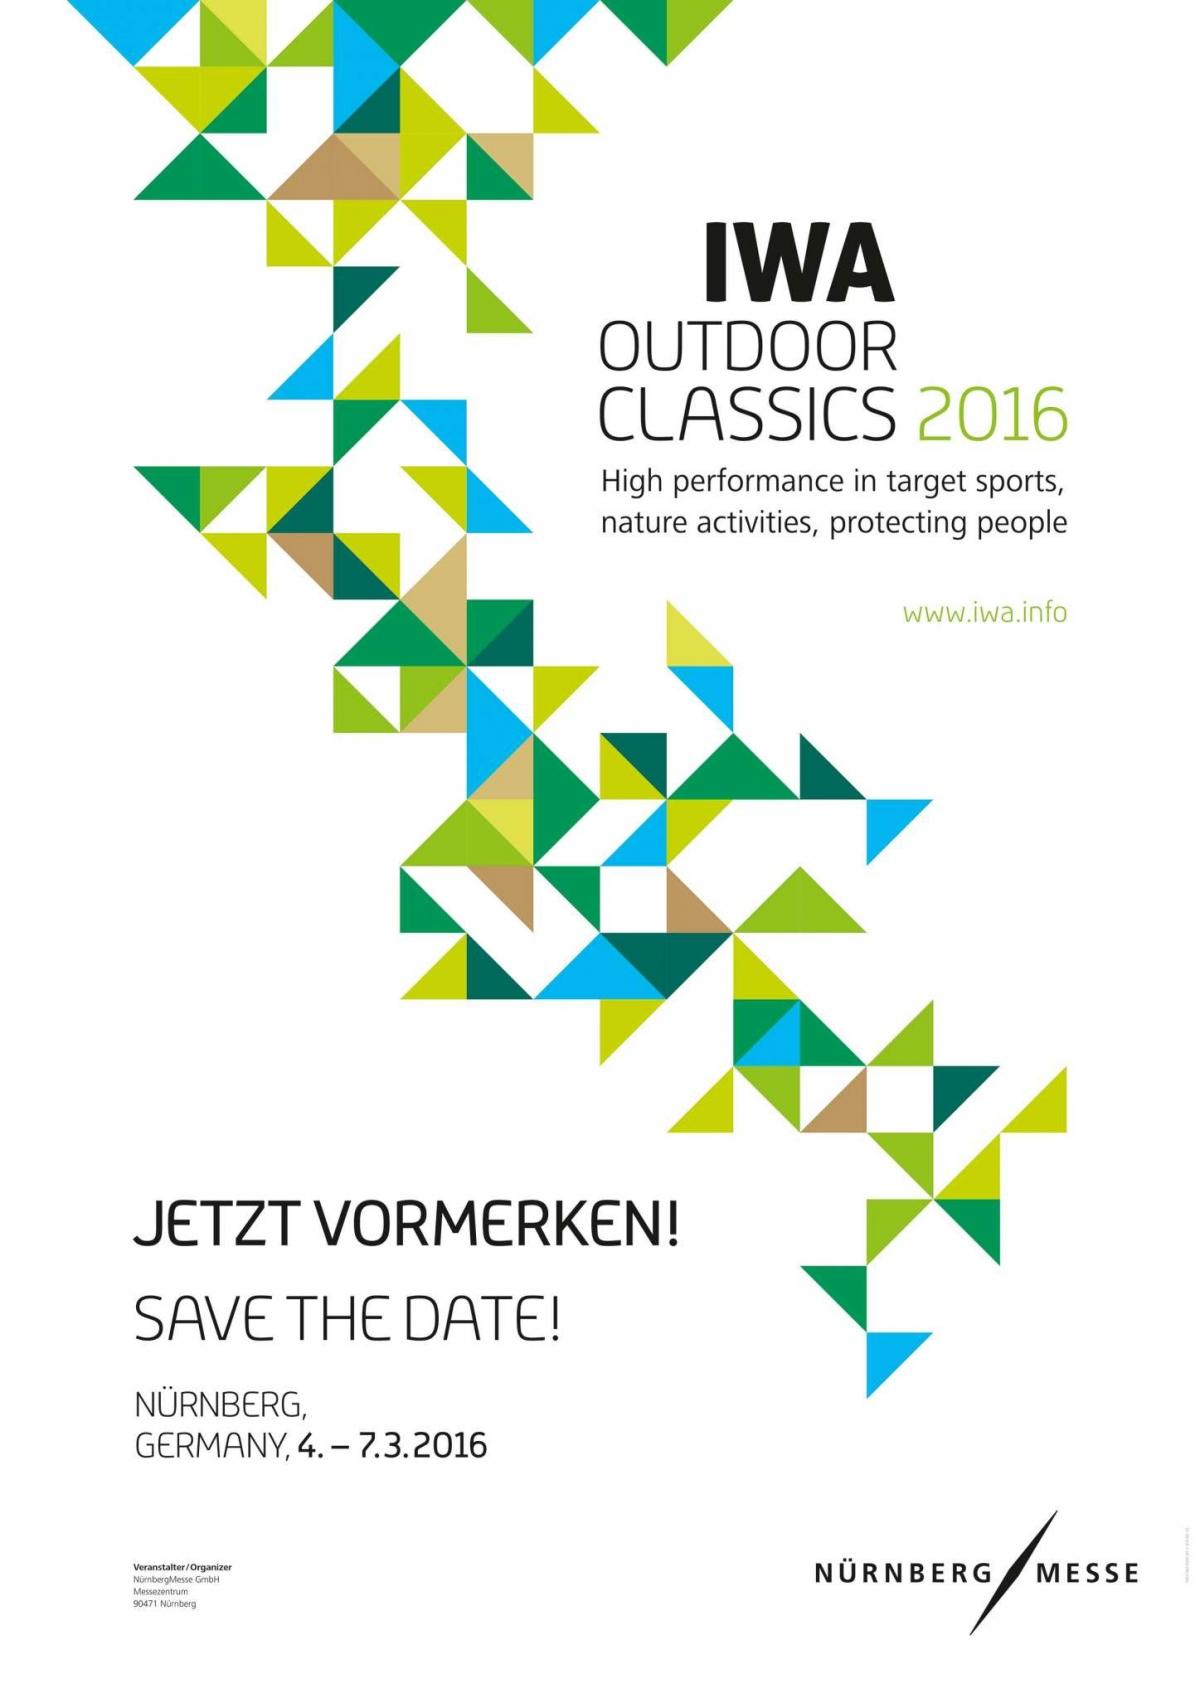 IWA Outdoor Classics 2016